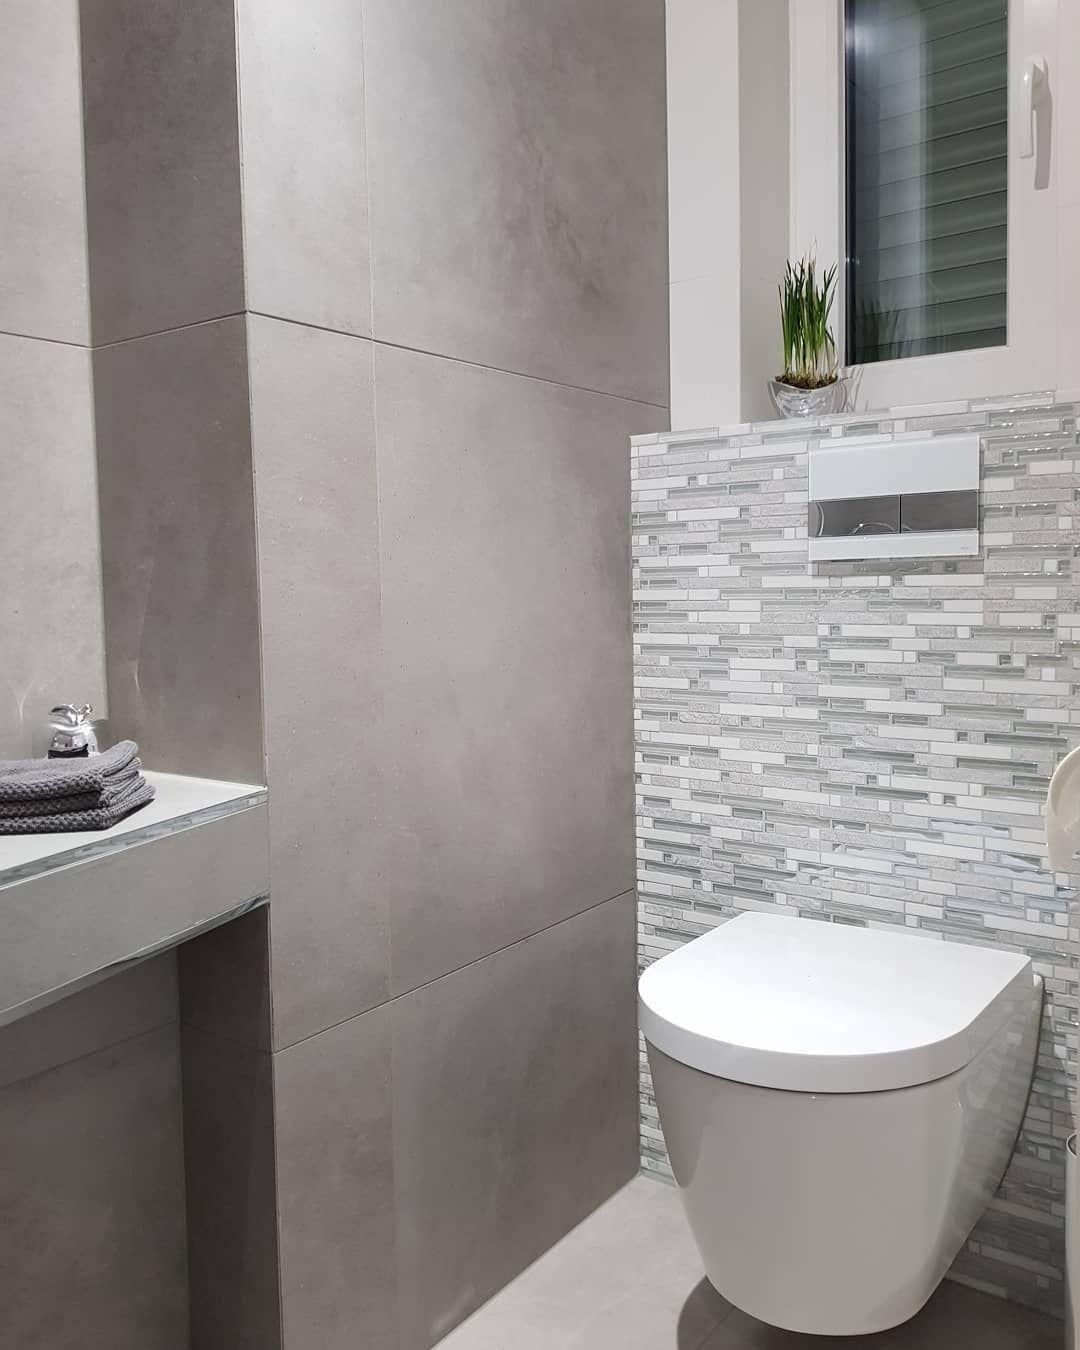 Izabela Kostka On Instagram Toaleta Wc Gastewc Hausbau Homesweethome Homeinspira Badezimmer Mosaik Badezimmer Fliesen Ideen Bilder Mosaik Fliesen Bad